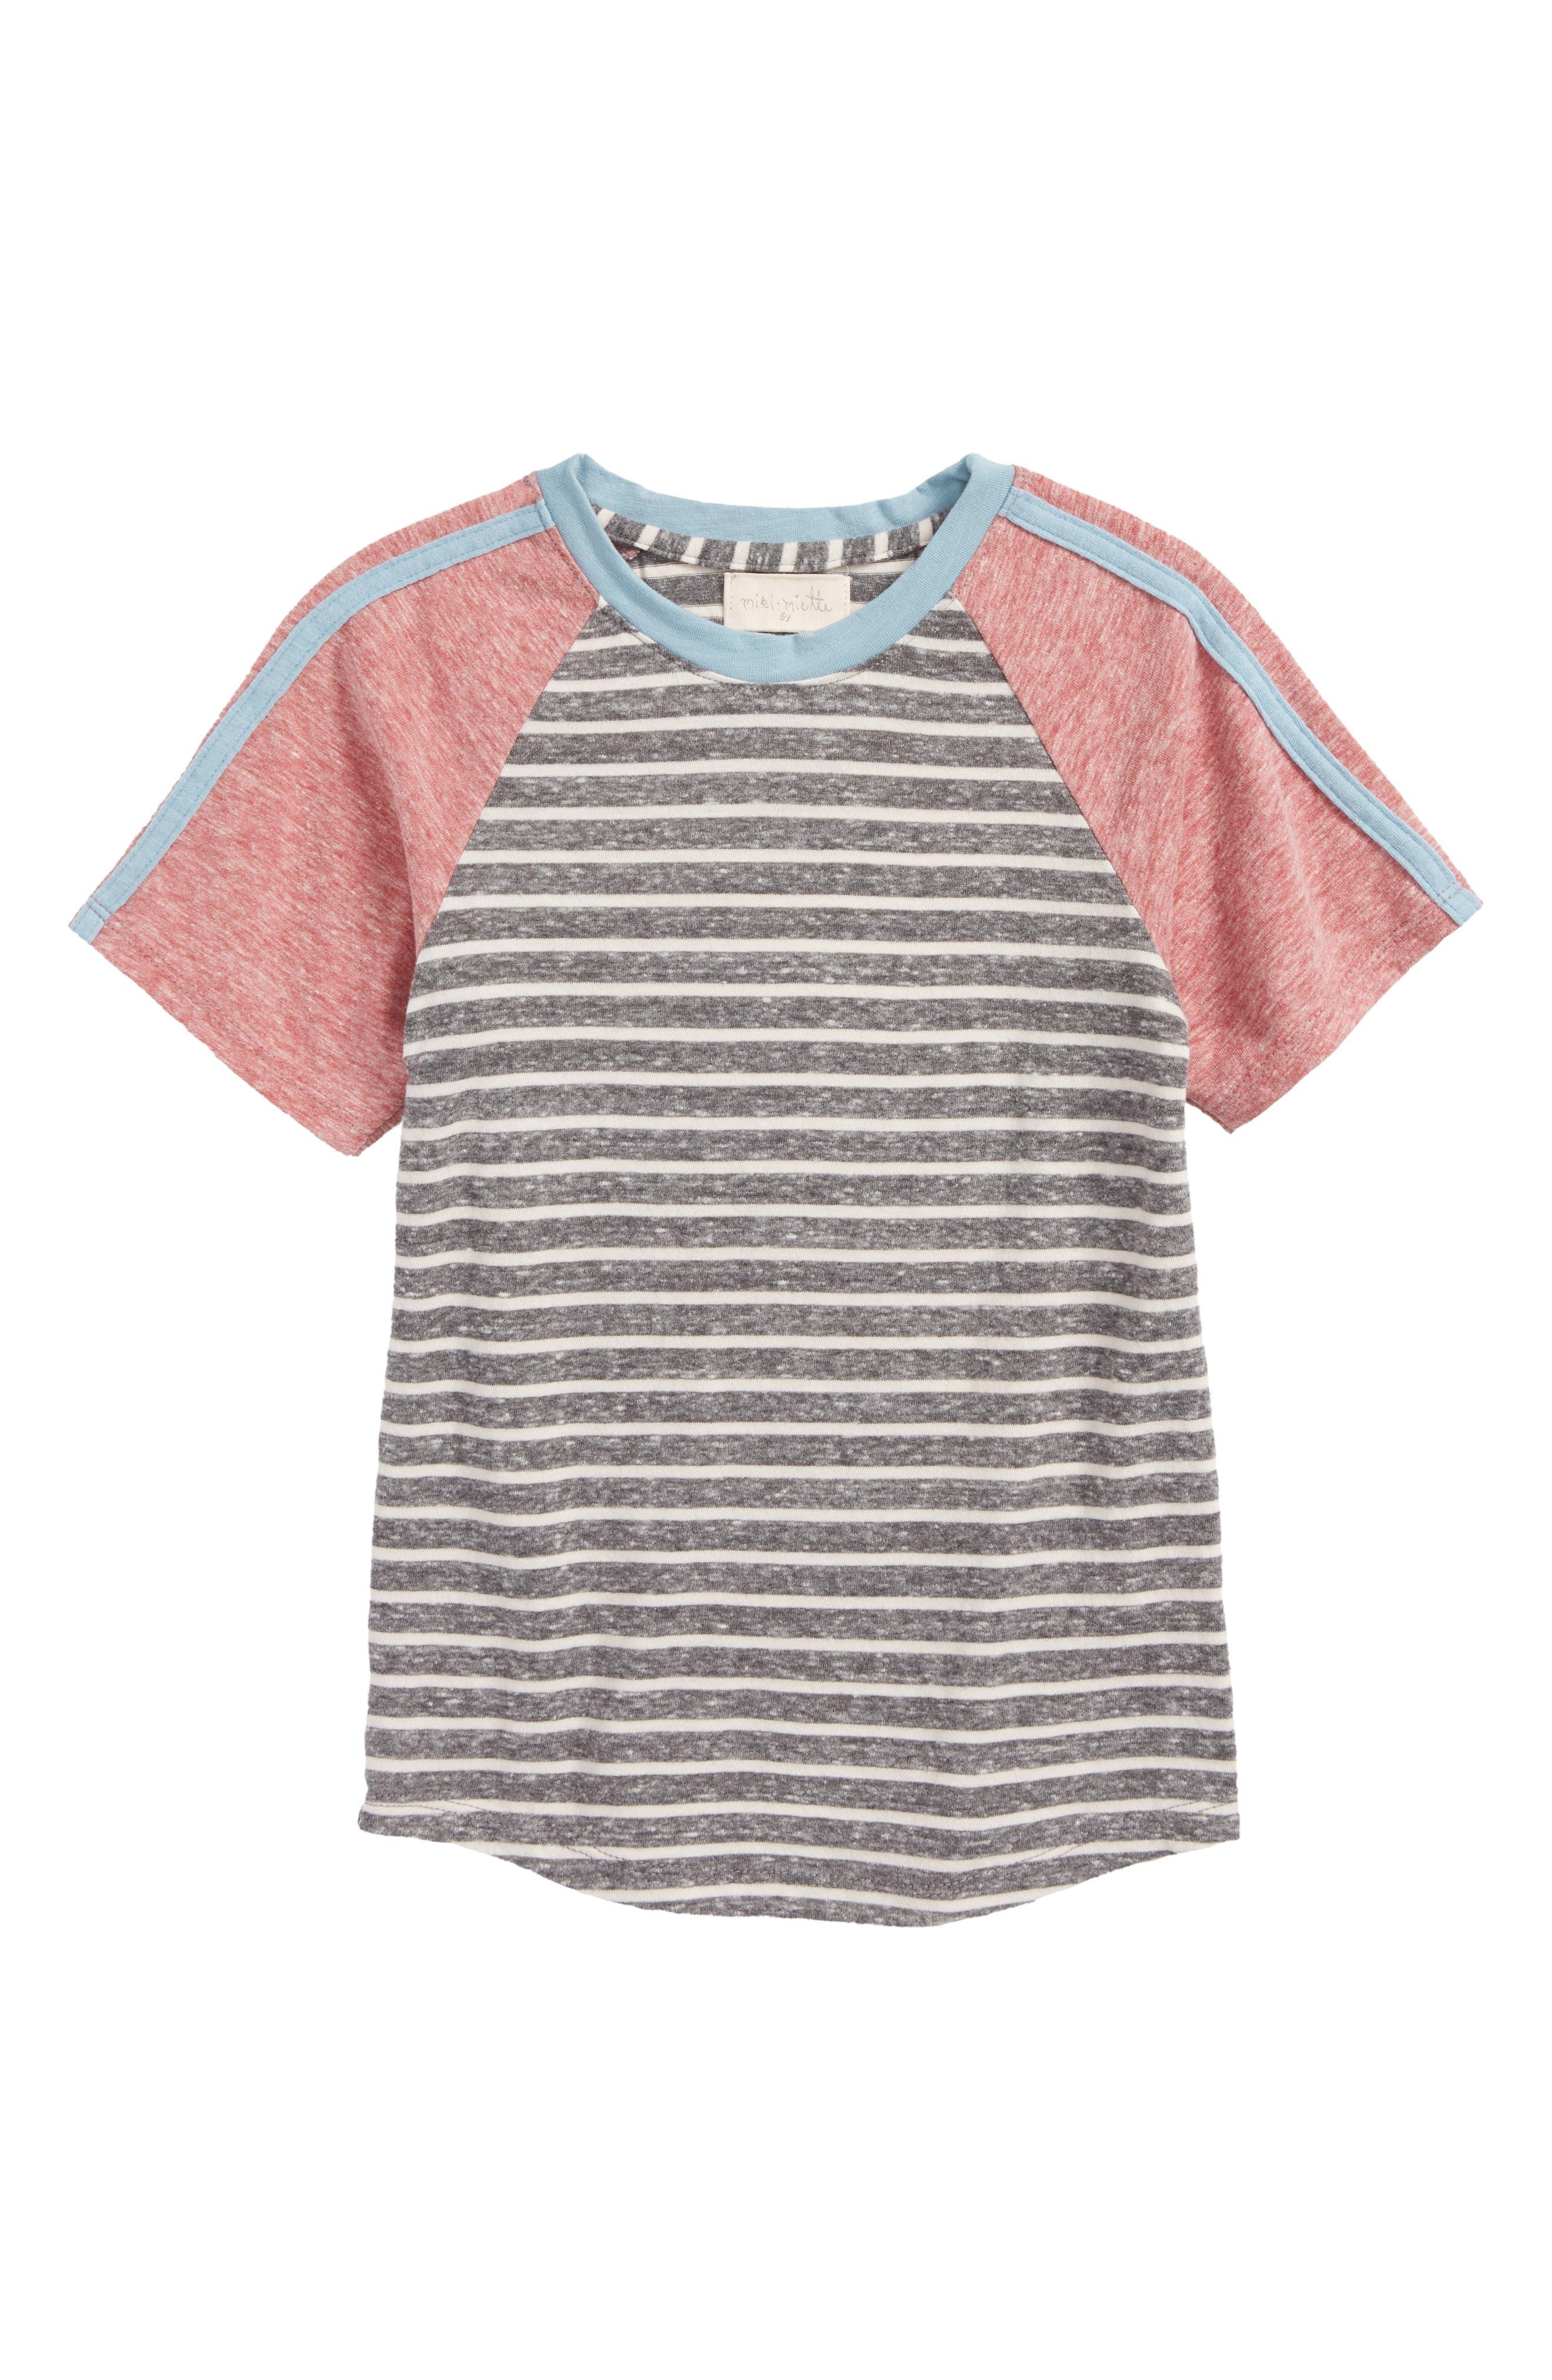 Miki Miette Erick Striped T-Shirt (Toddler Boys, Little Boys & Big Boys)